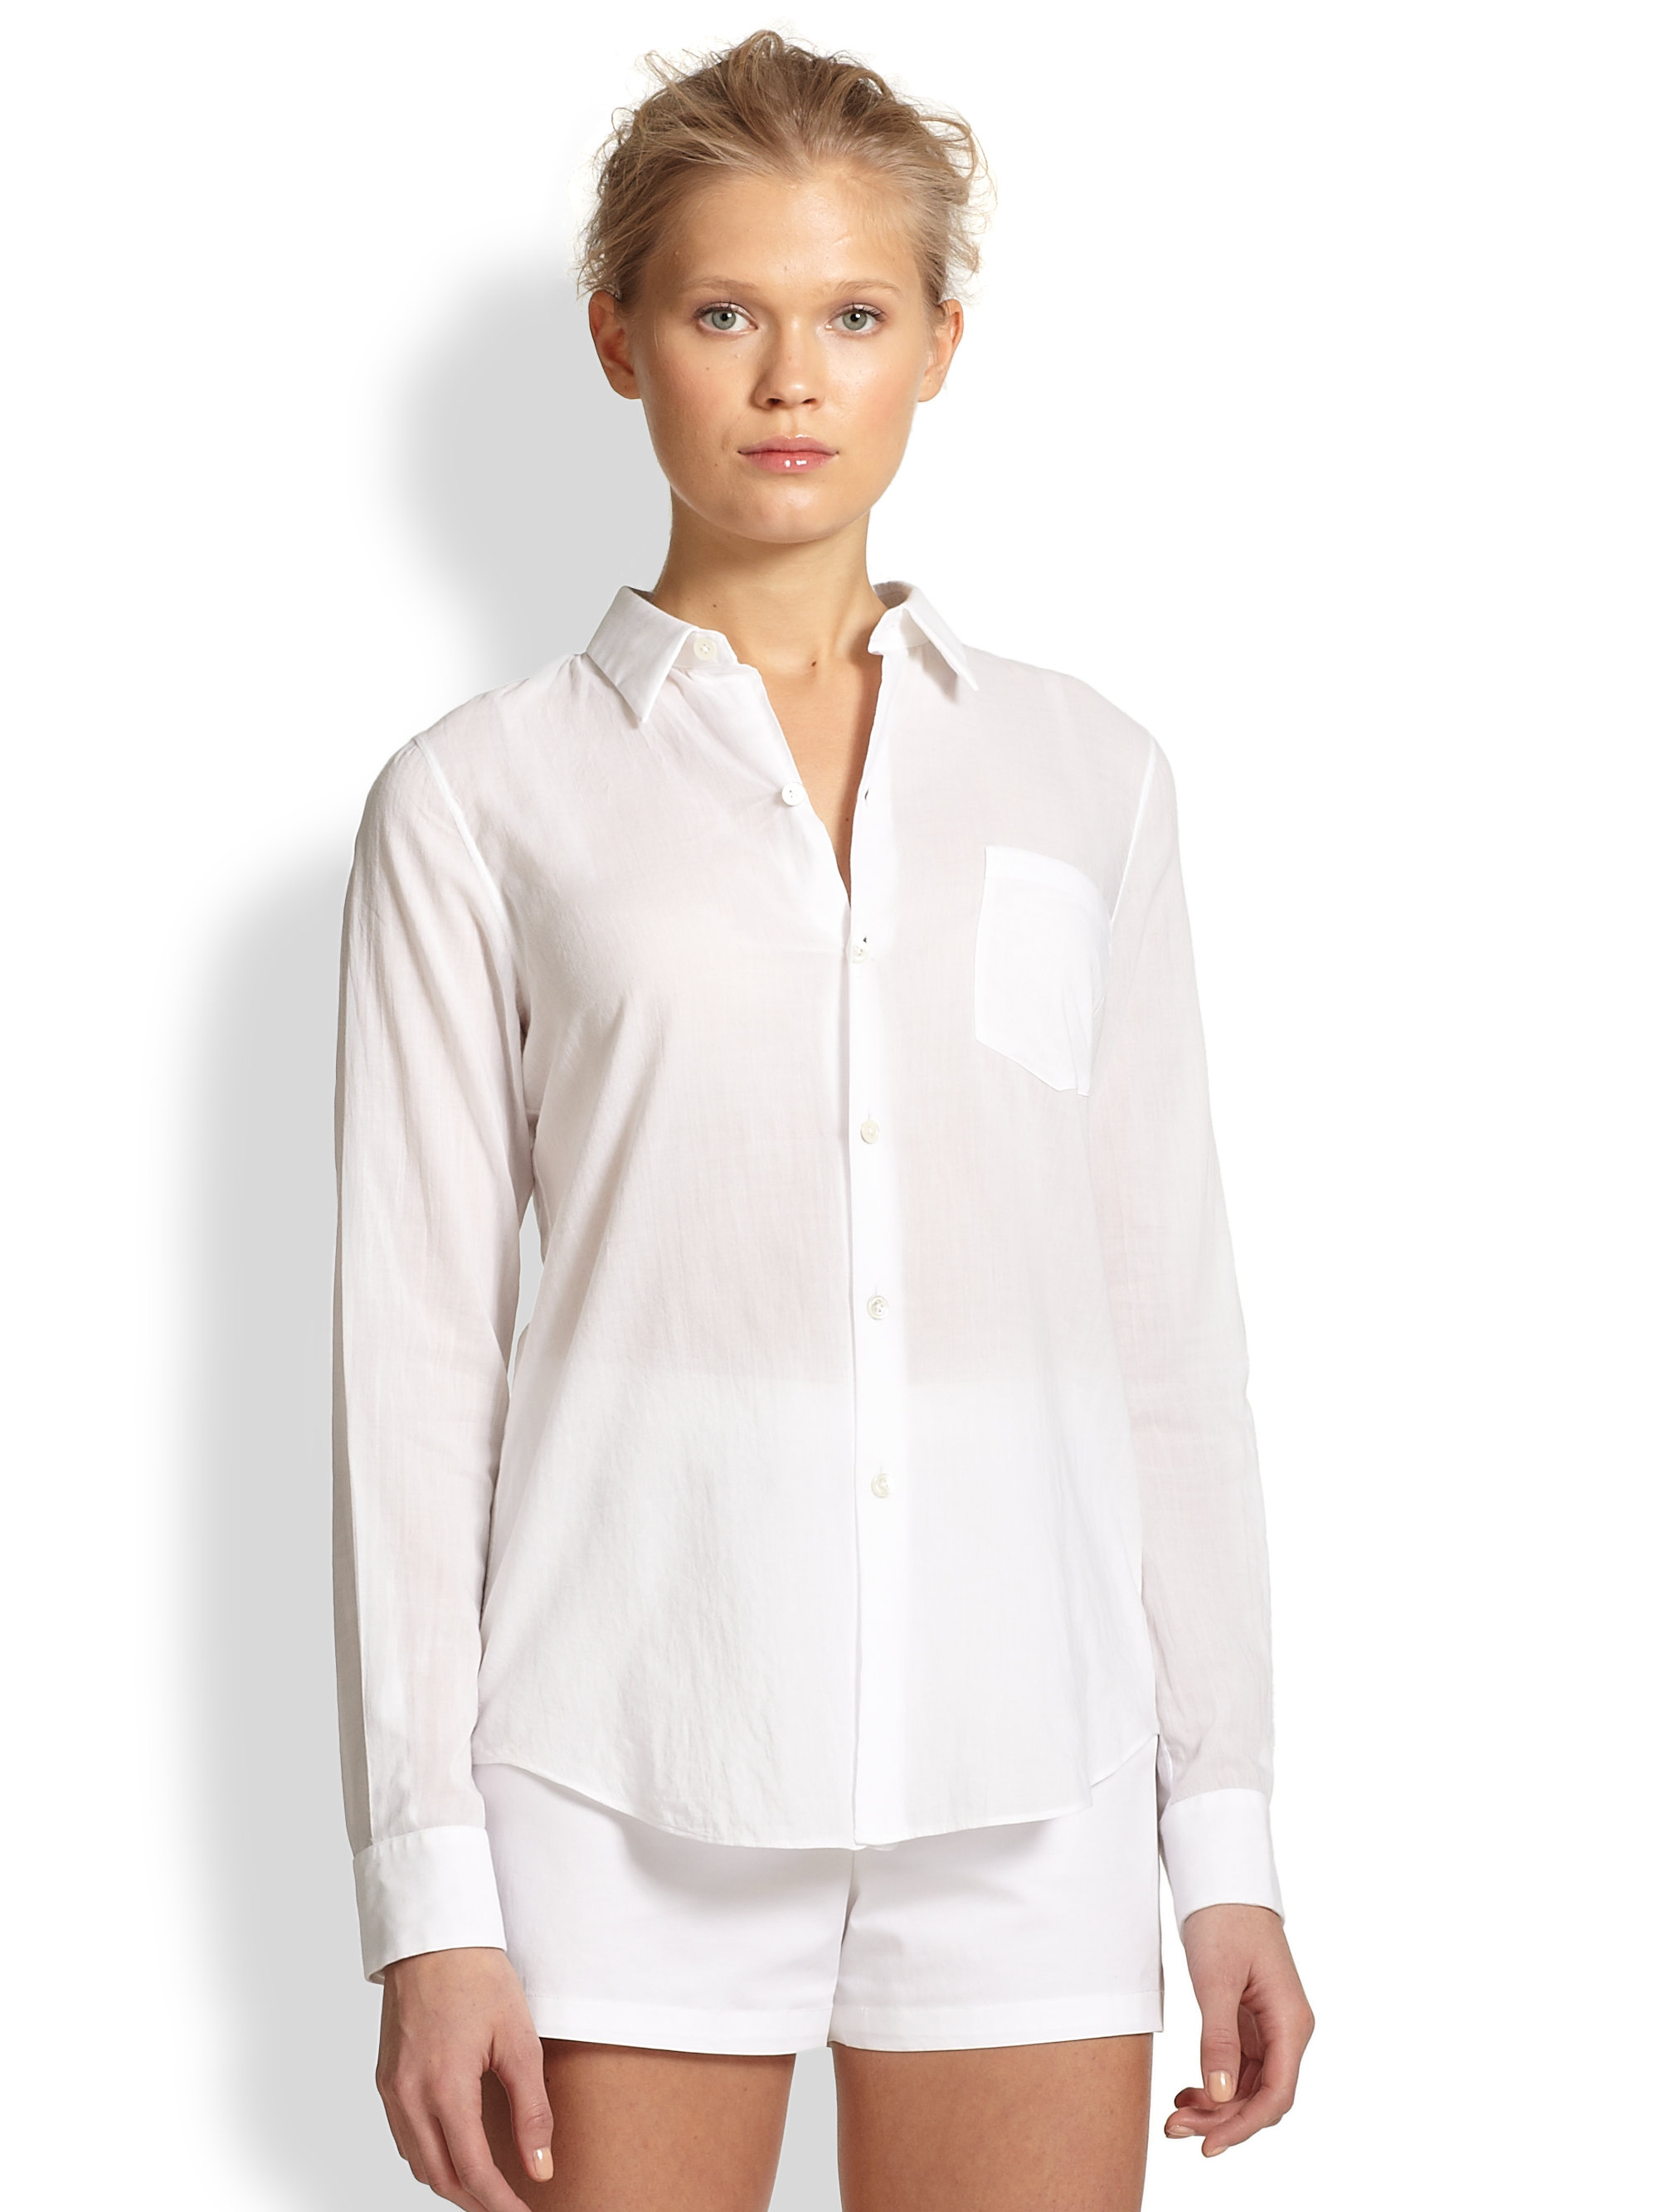 Classic White Blouse Shirt